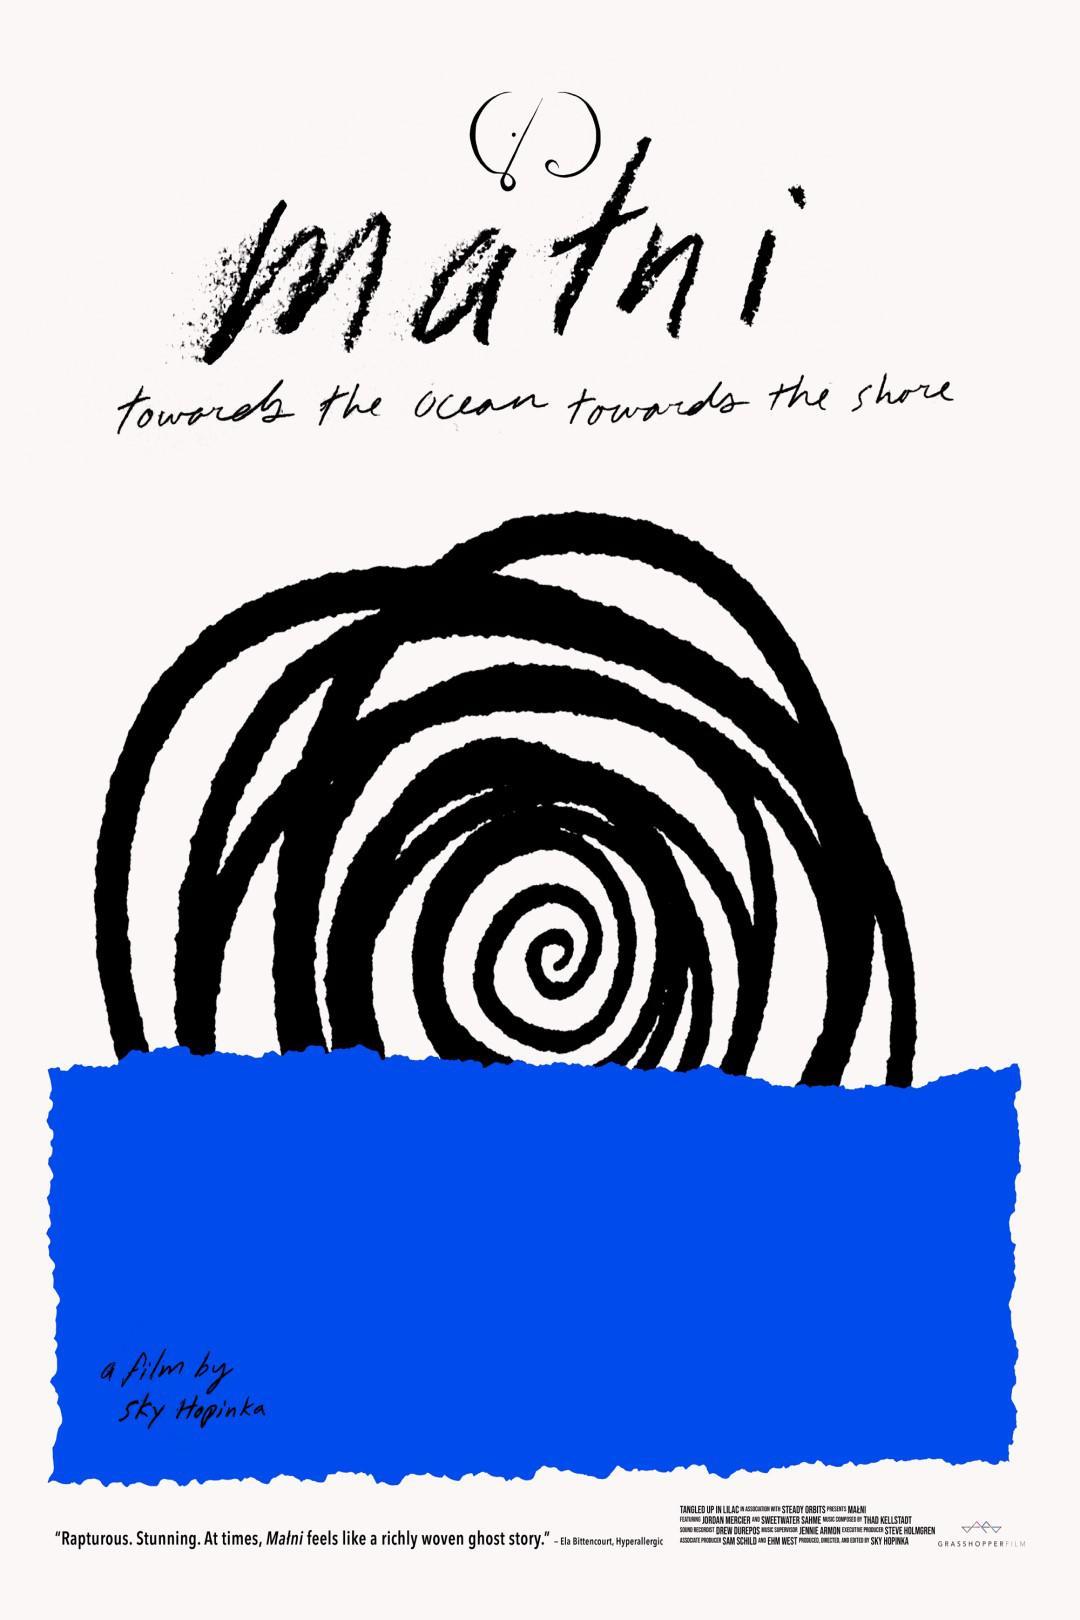 Malni - Towards the Ocean, Towards the Shore